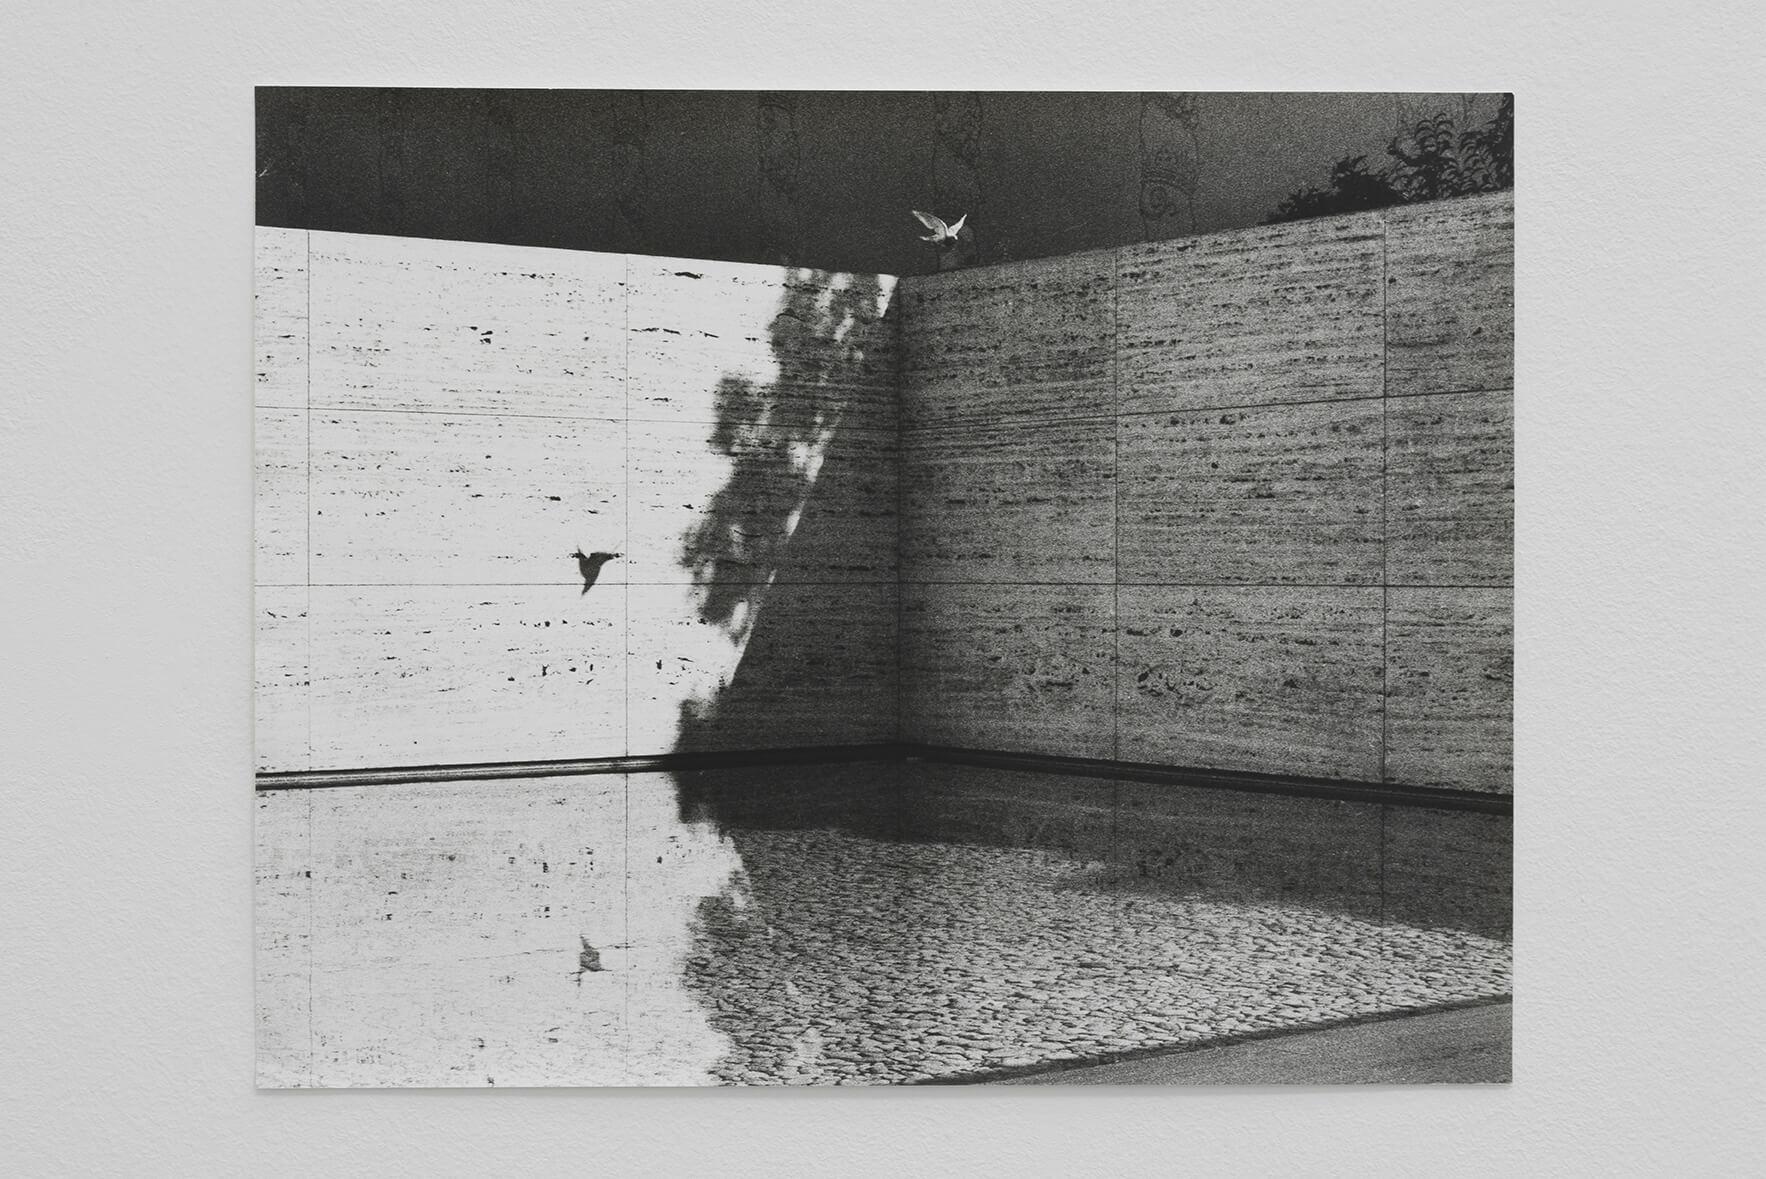 Untitled (Barcelona Pavilion), 2007 |  | ProjecteSD